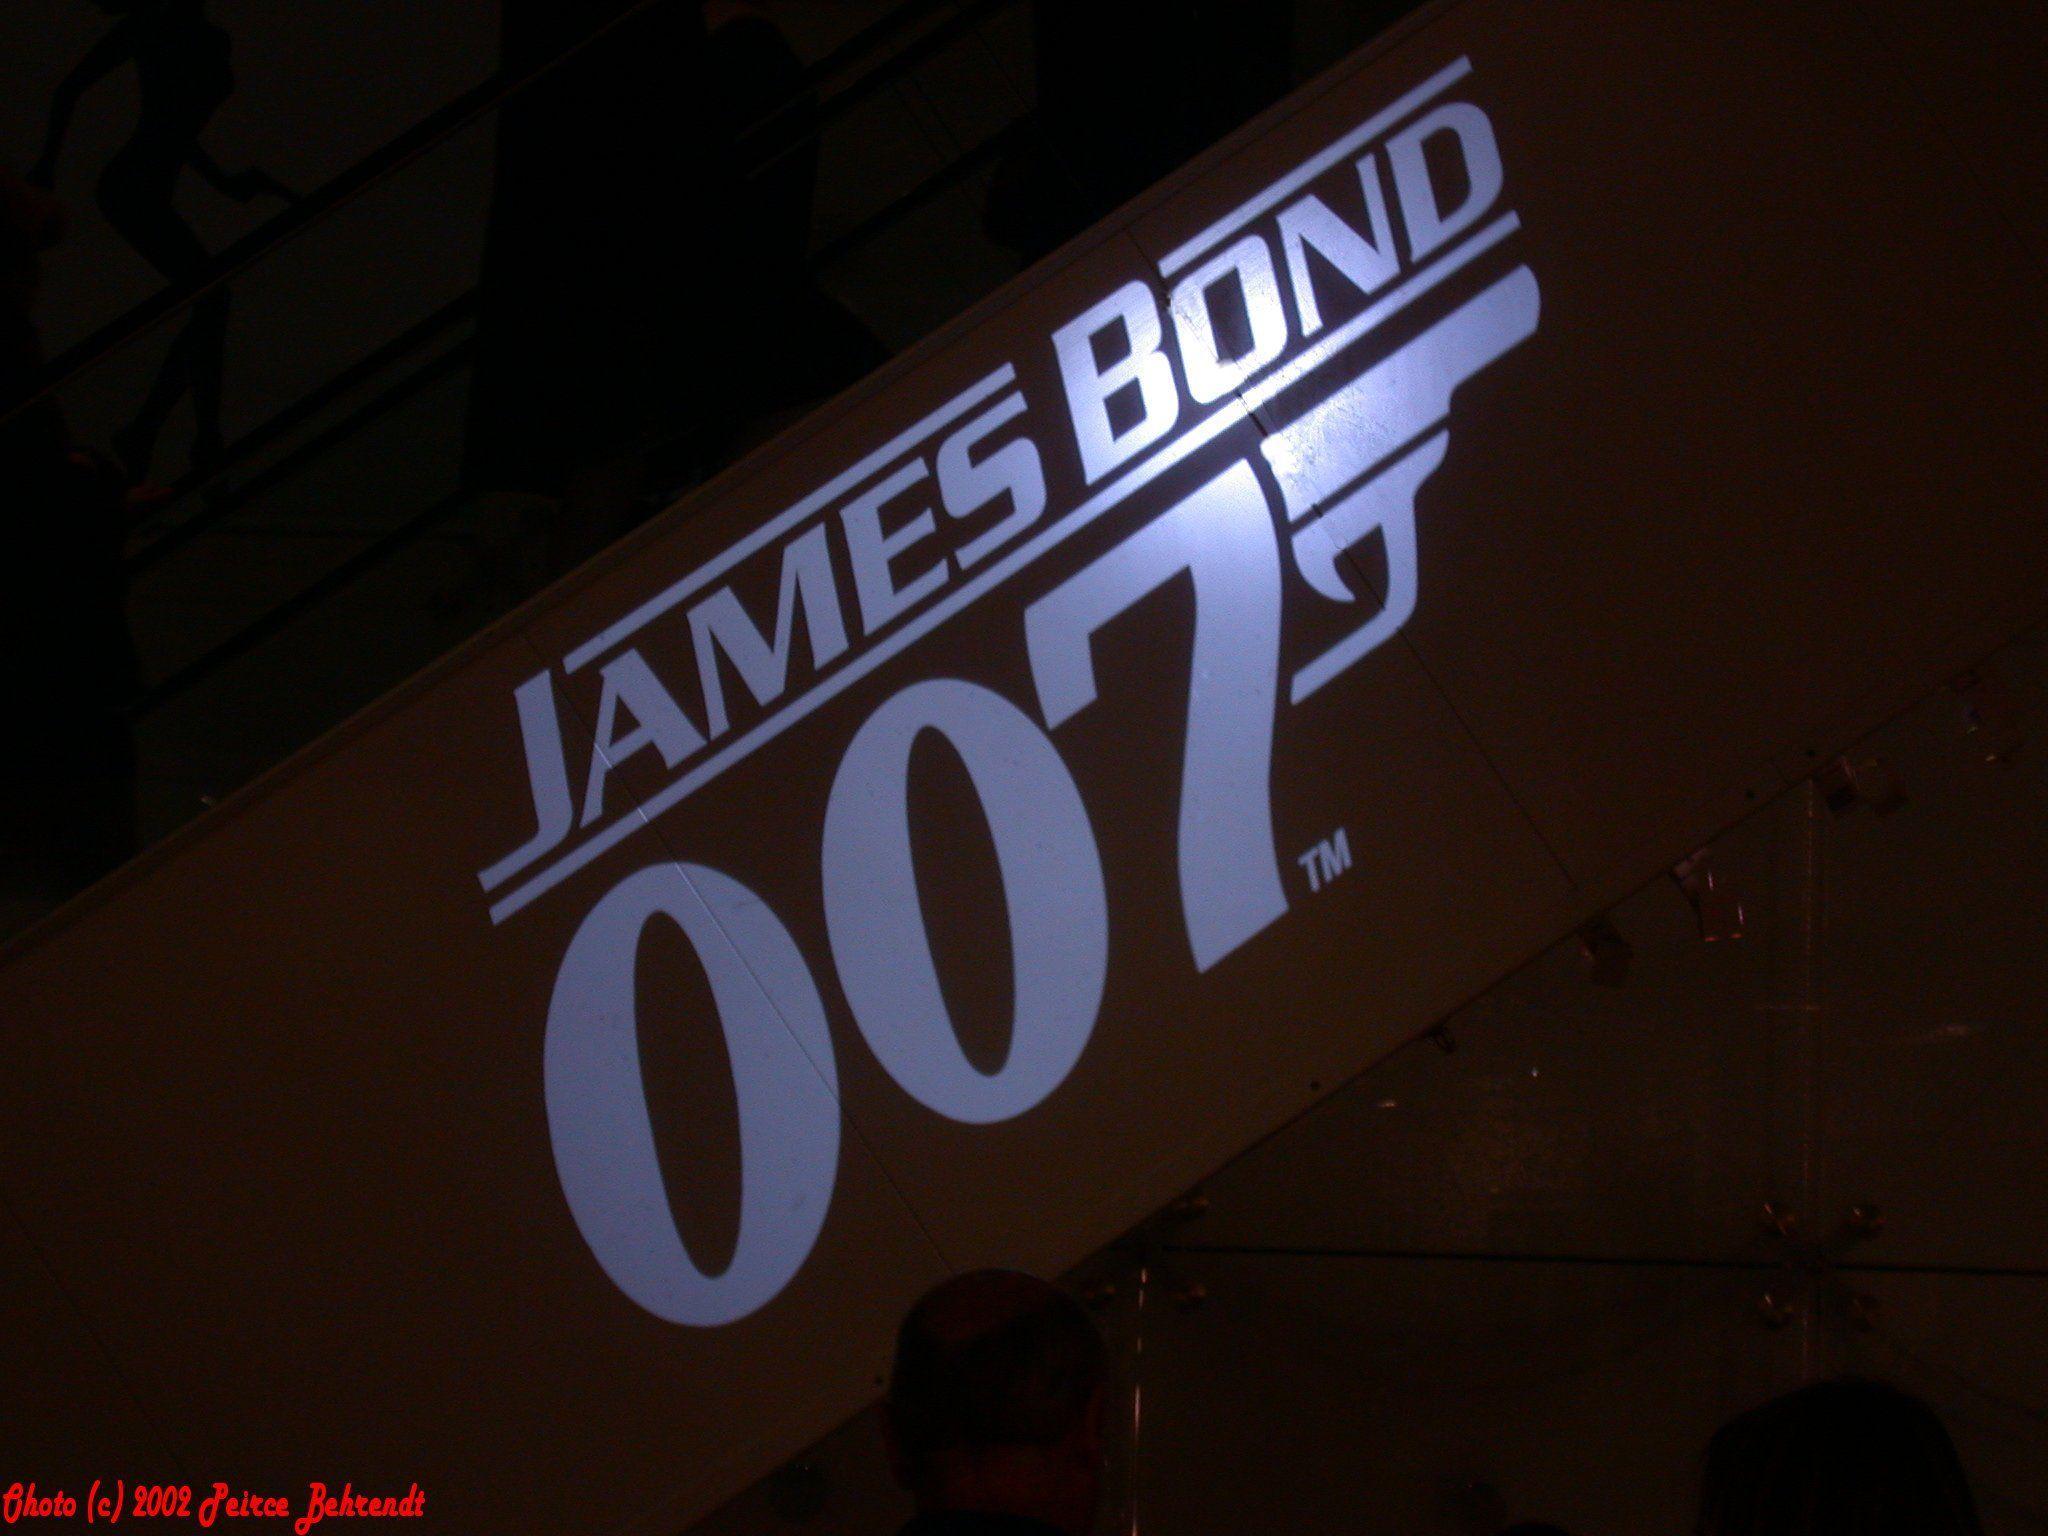 james bond 007 logo wallpapers wallpaper cave